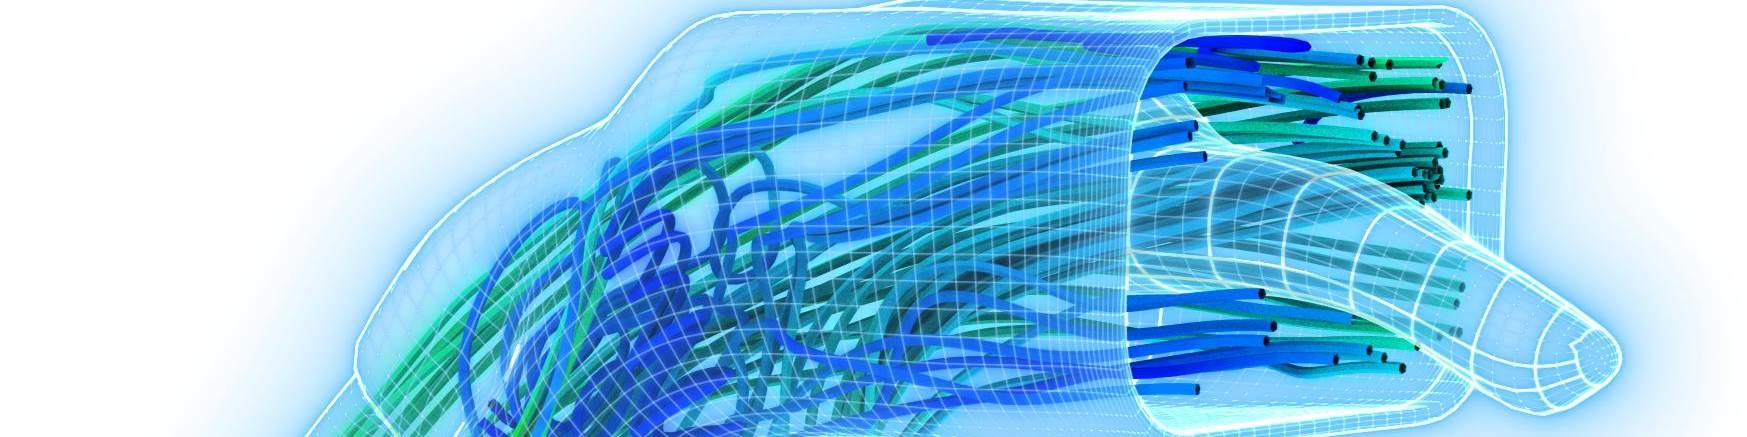 computational fluid dynamics data